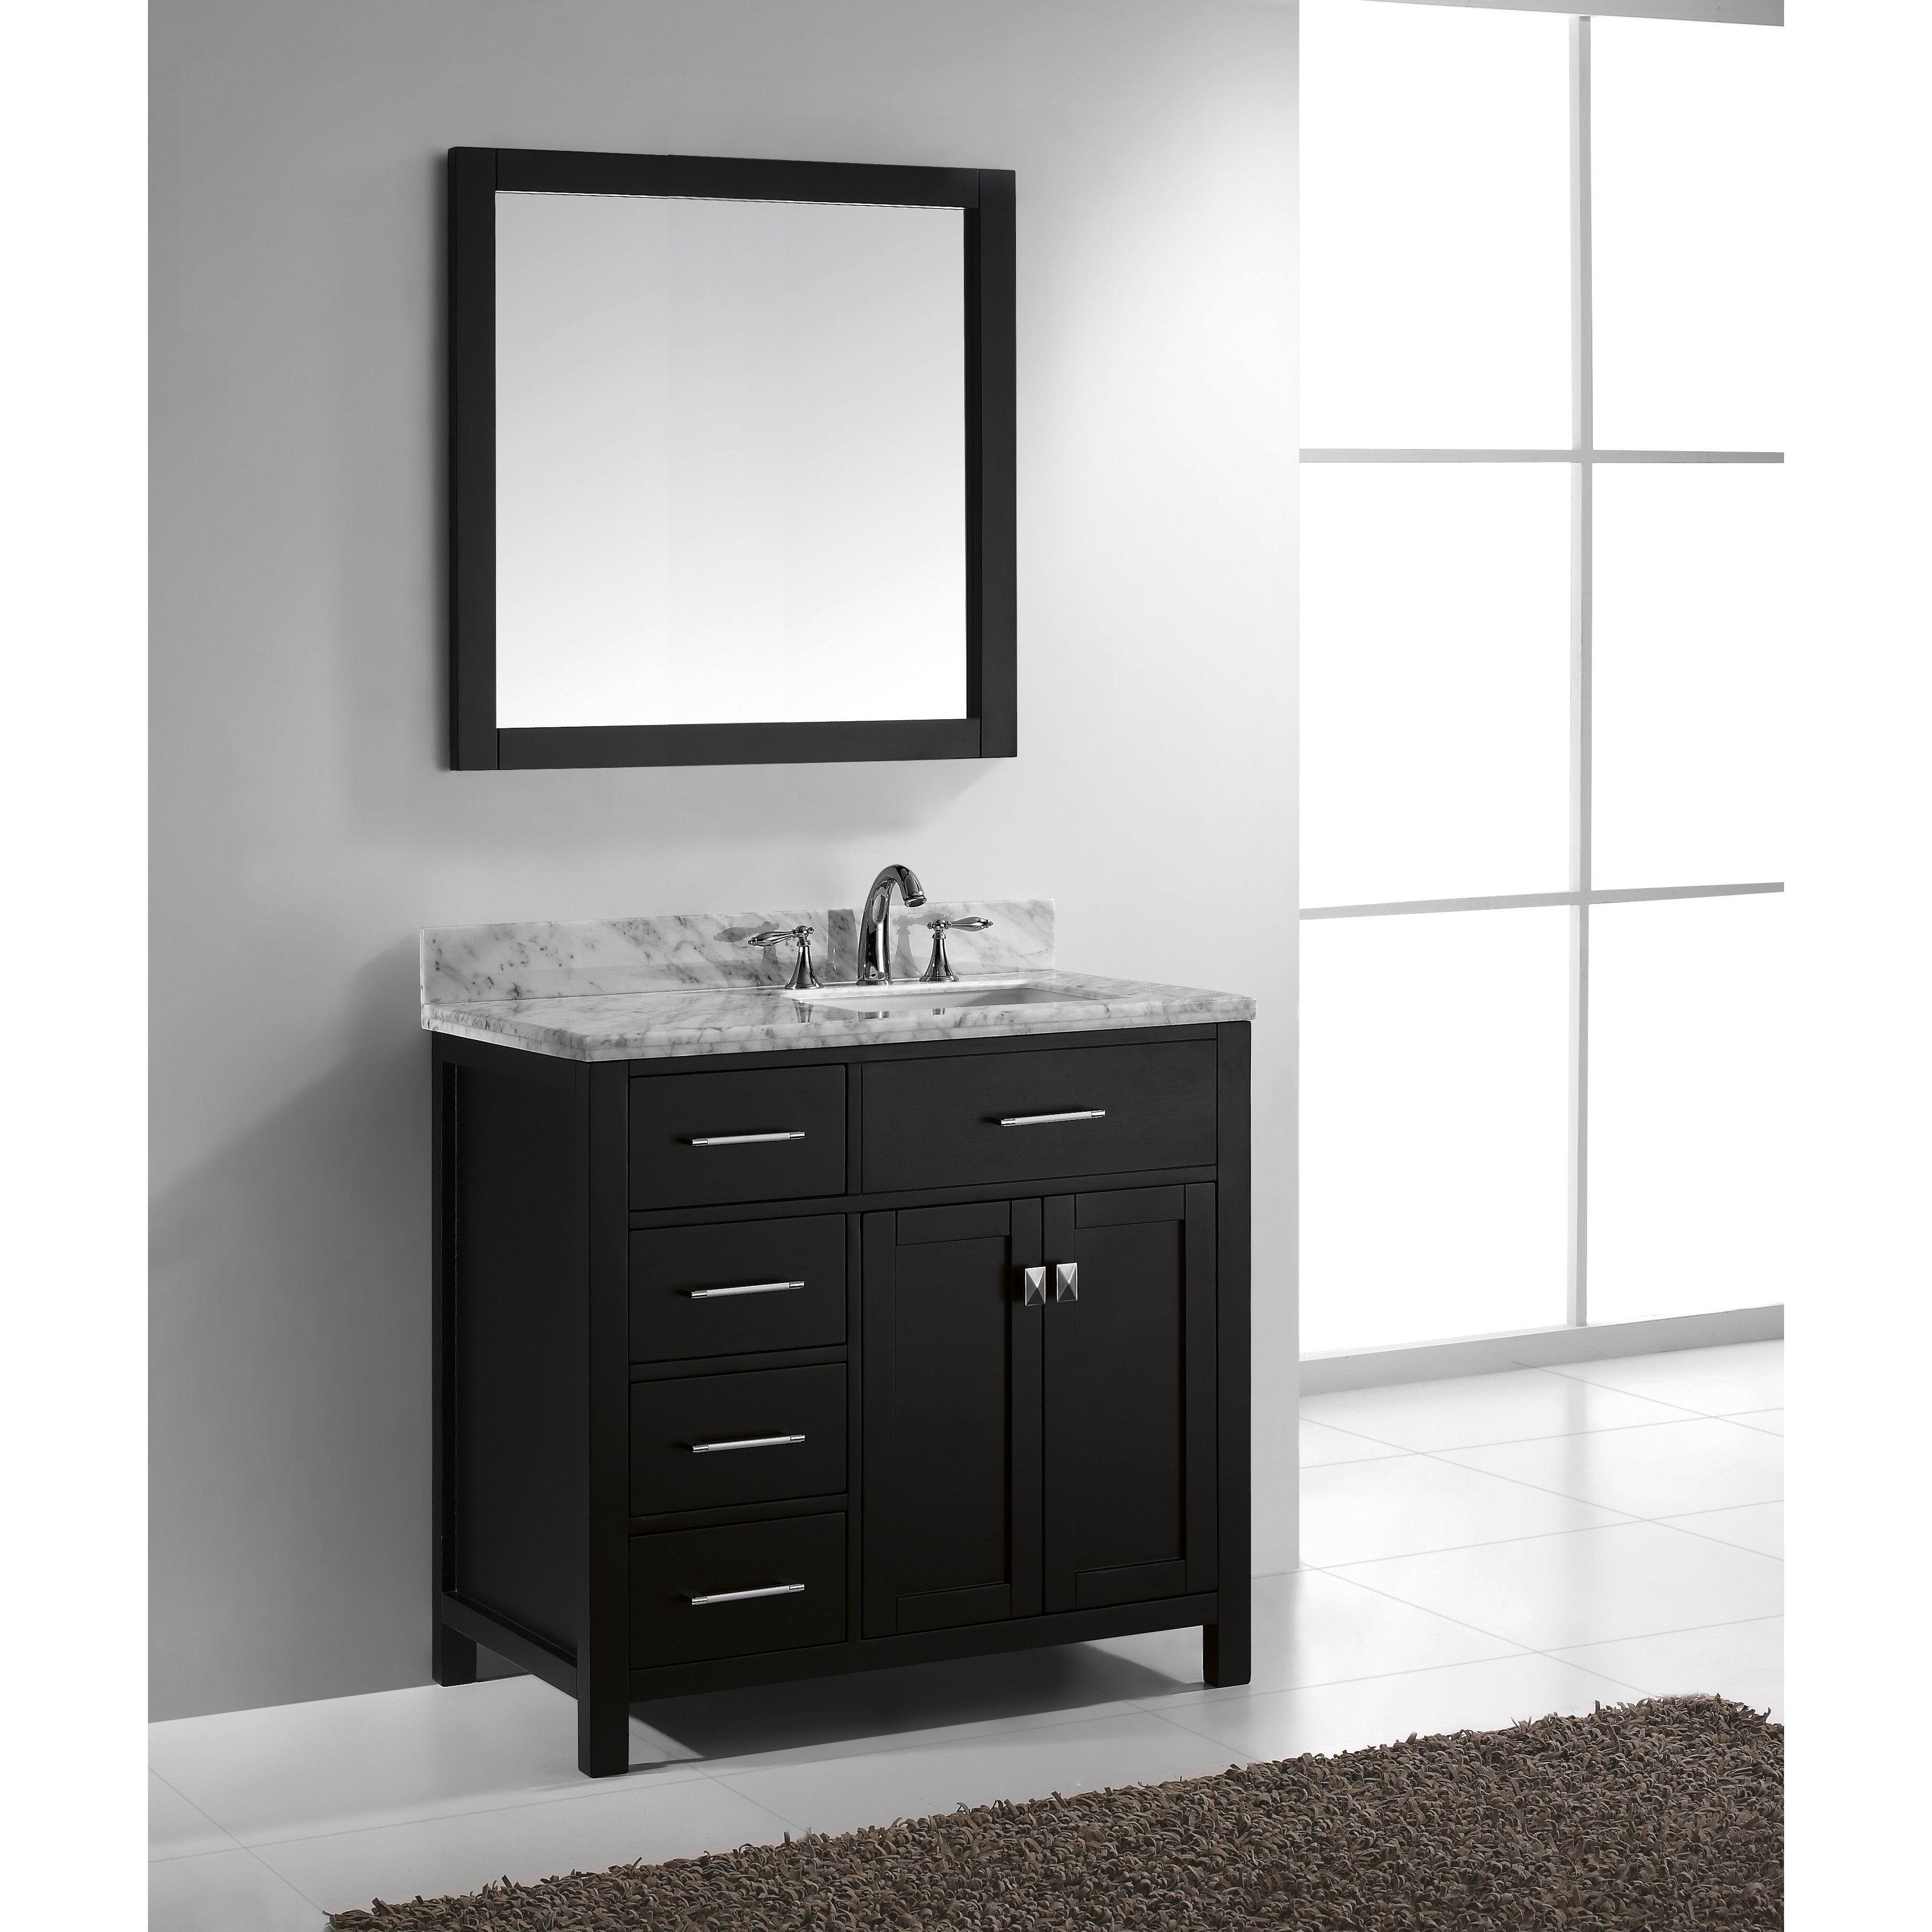 Virtu caroline parkway 35 single bathroom vanity set with for Bathroom mirror set